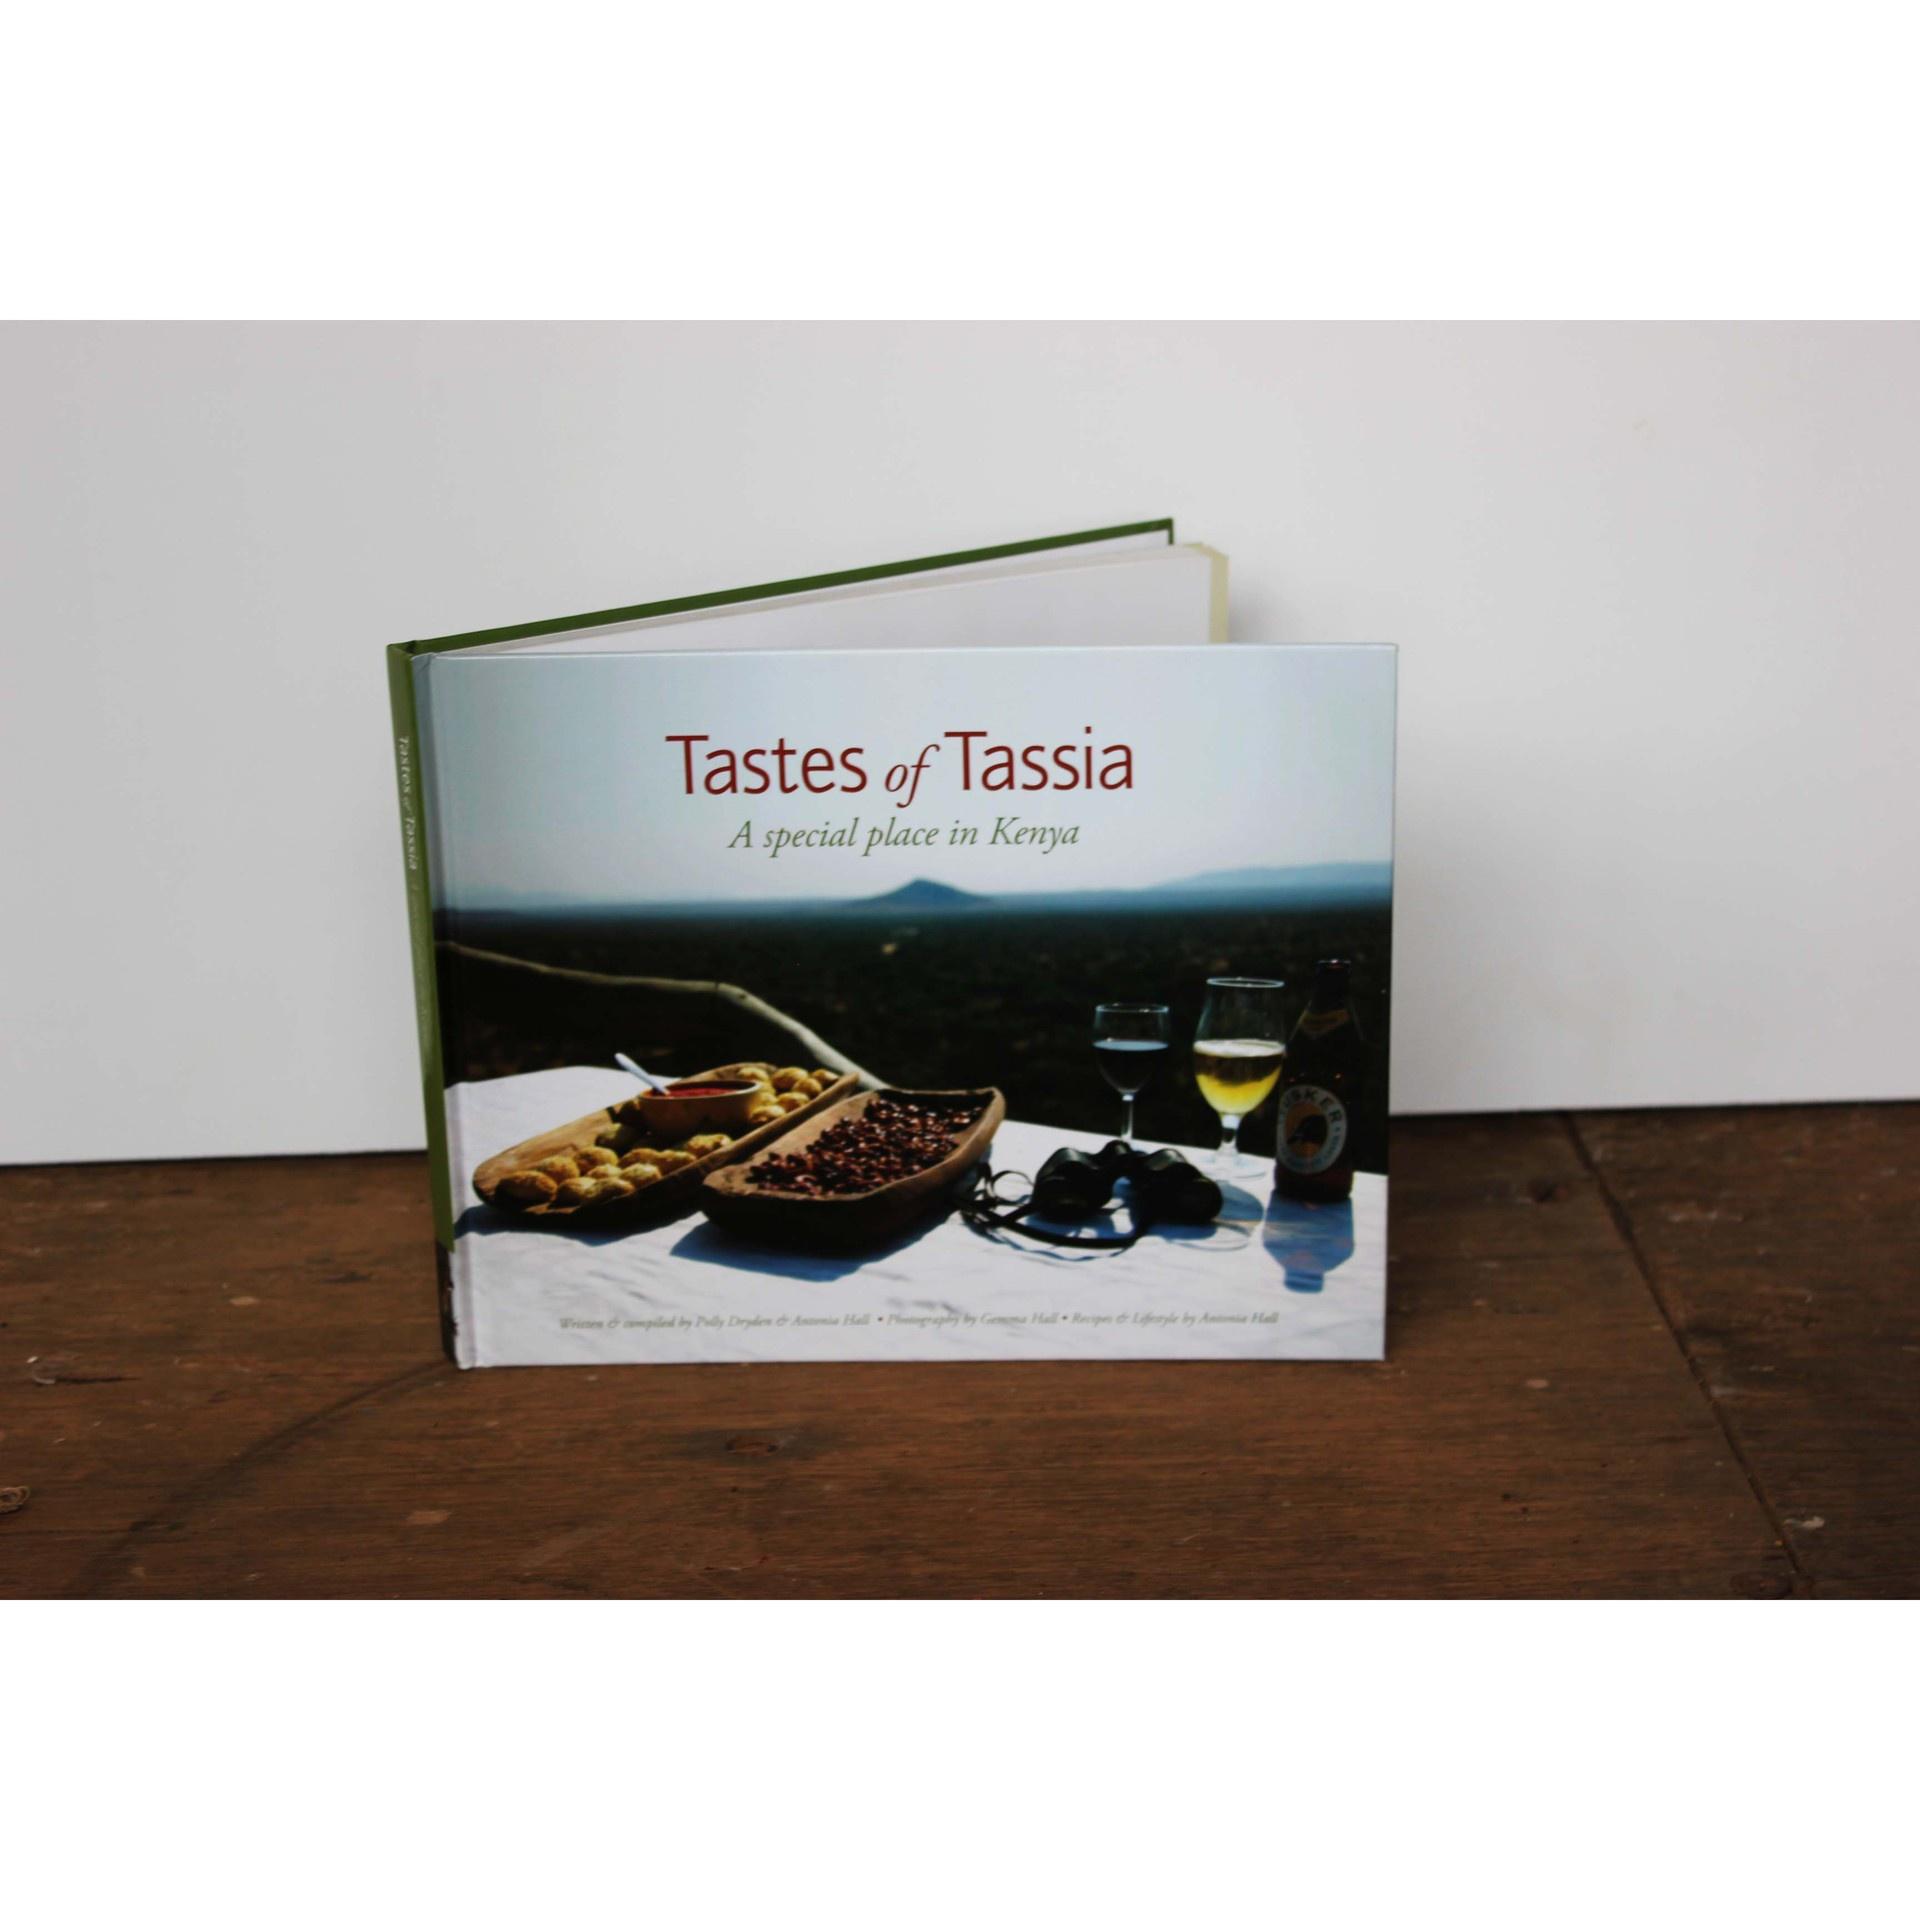 Tassia cook book